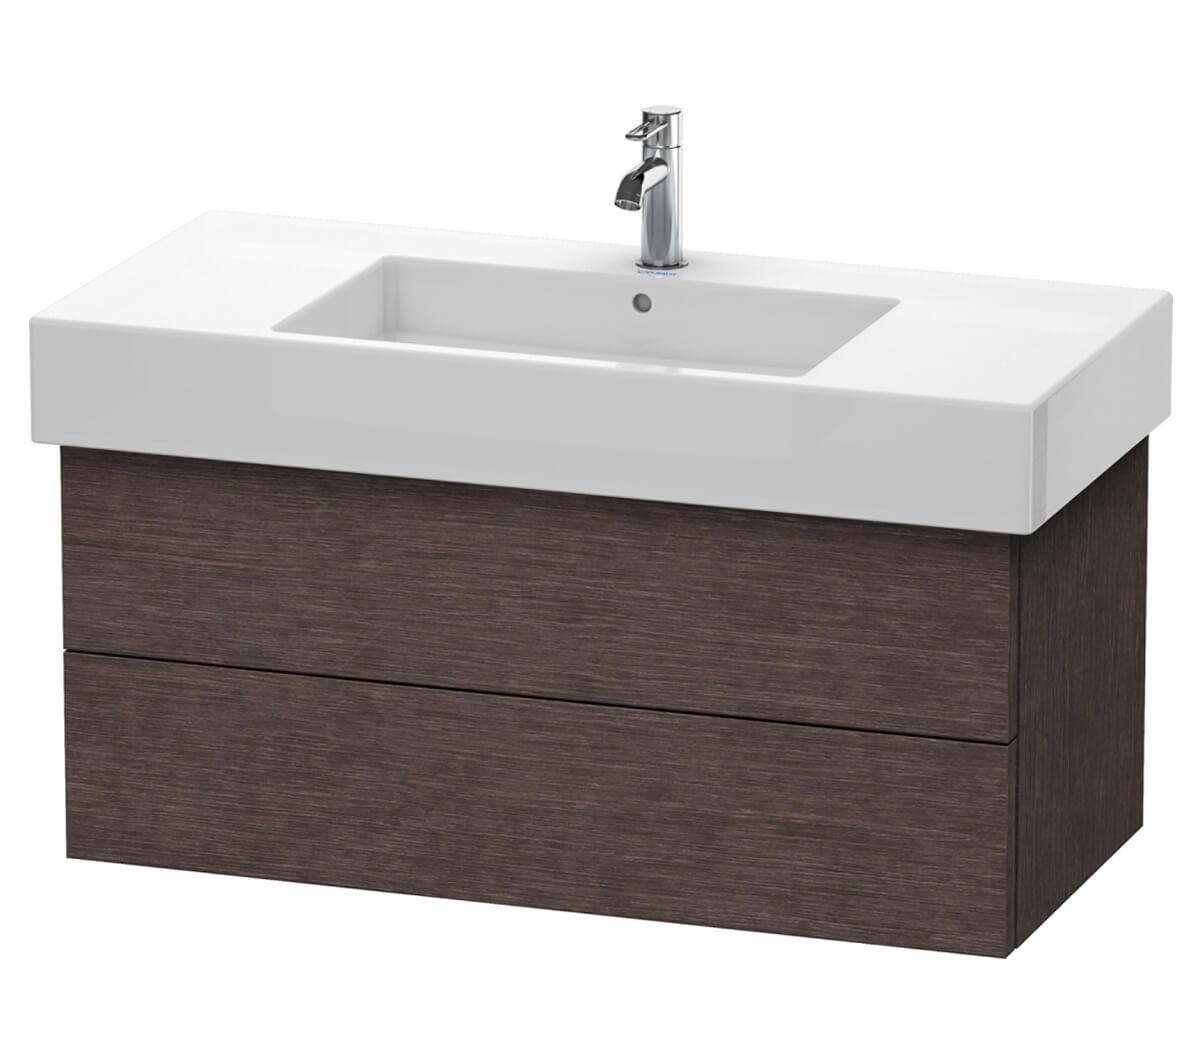 Pine Bathroom Vanity Unit: Duravit Delos 1000 X 470mm 2 Drawer Vanity Unit With Basin